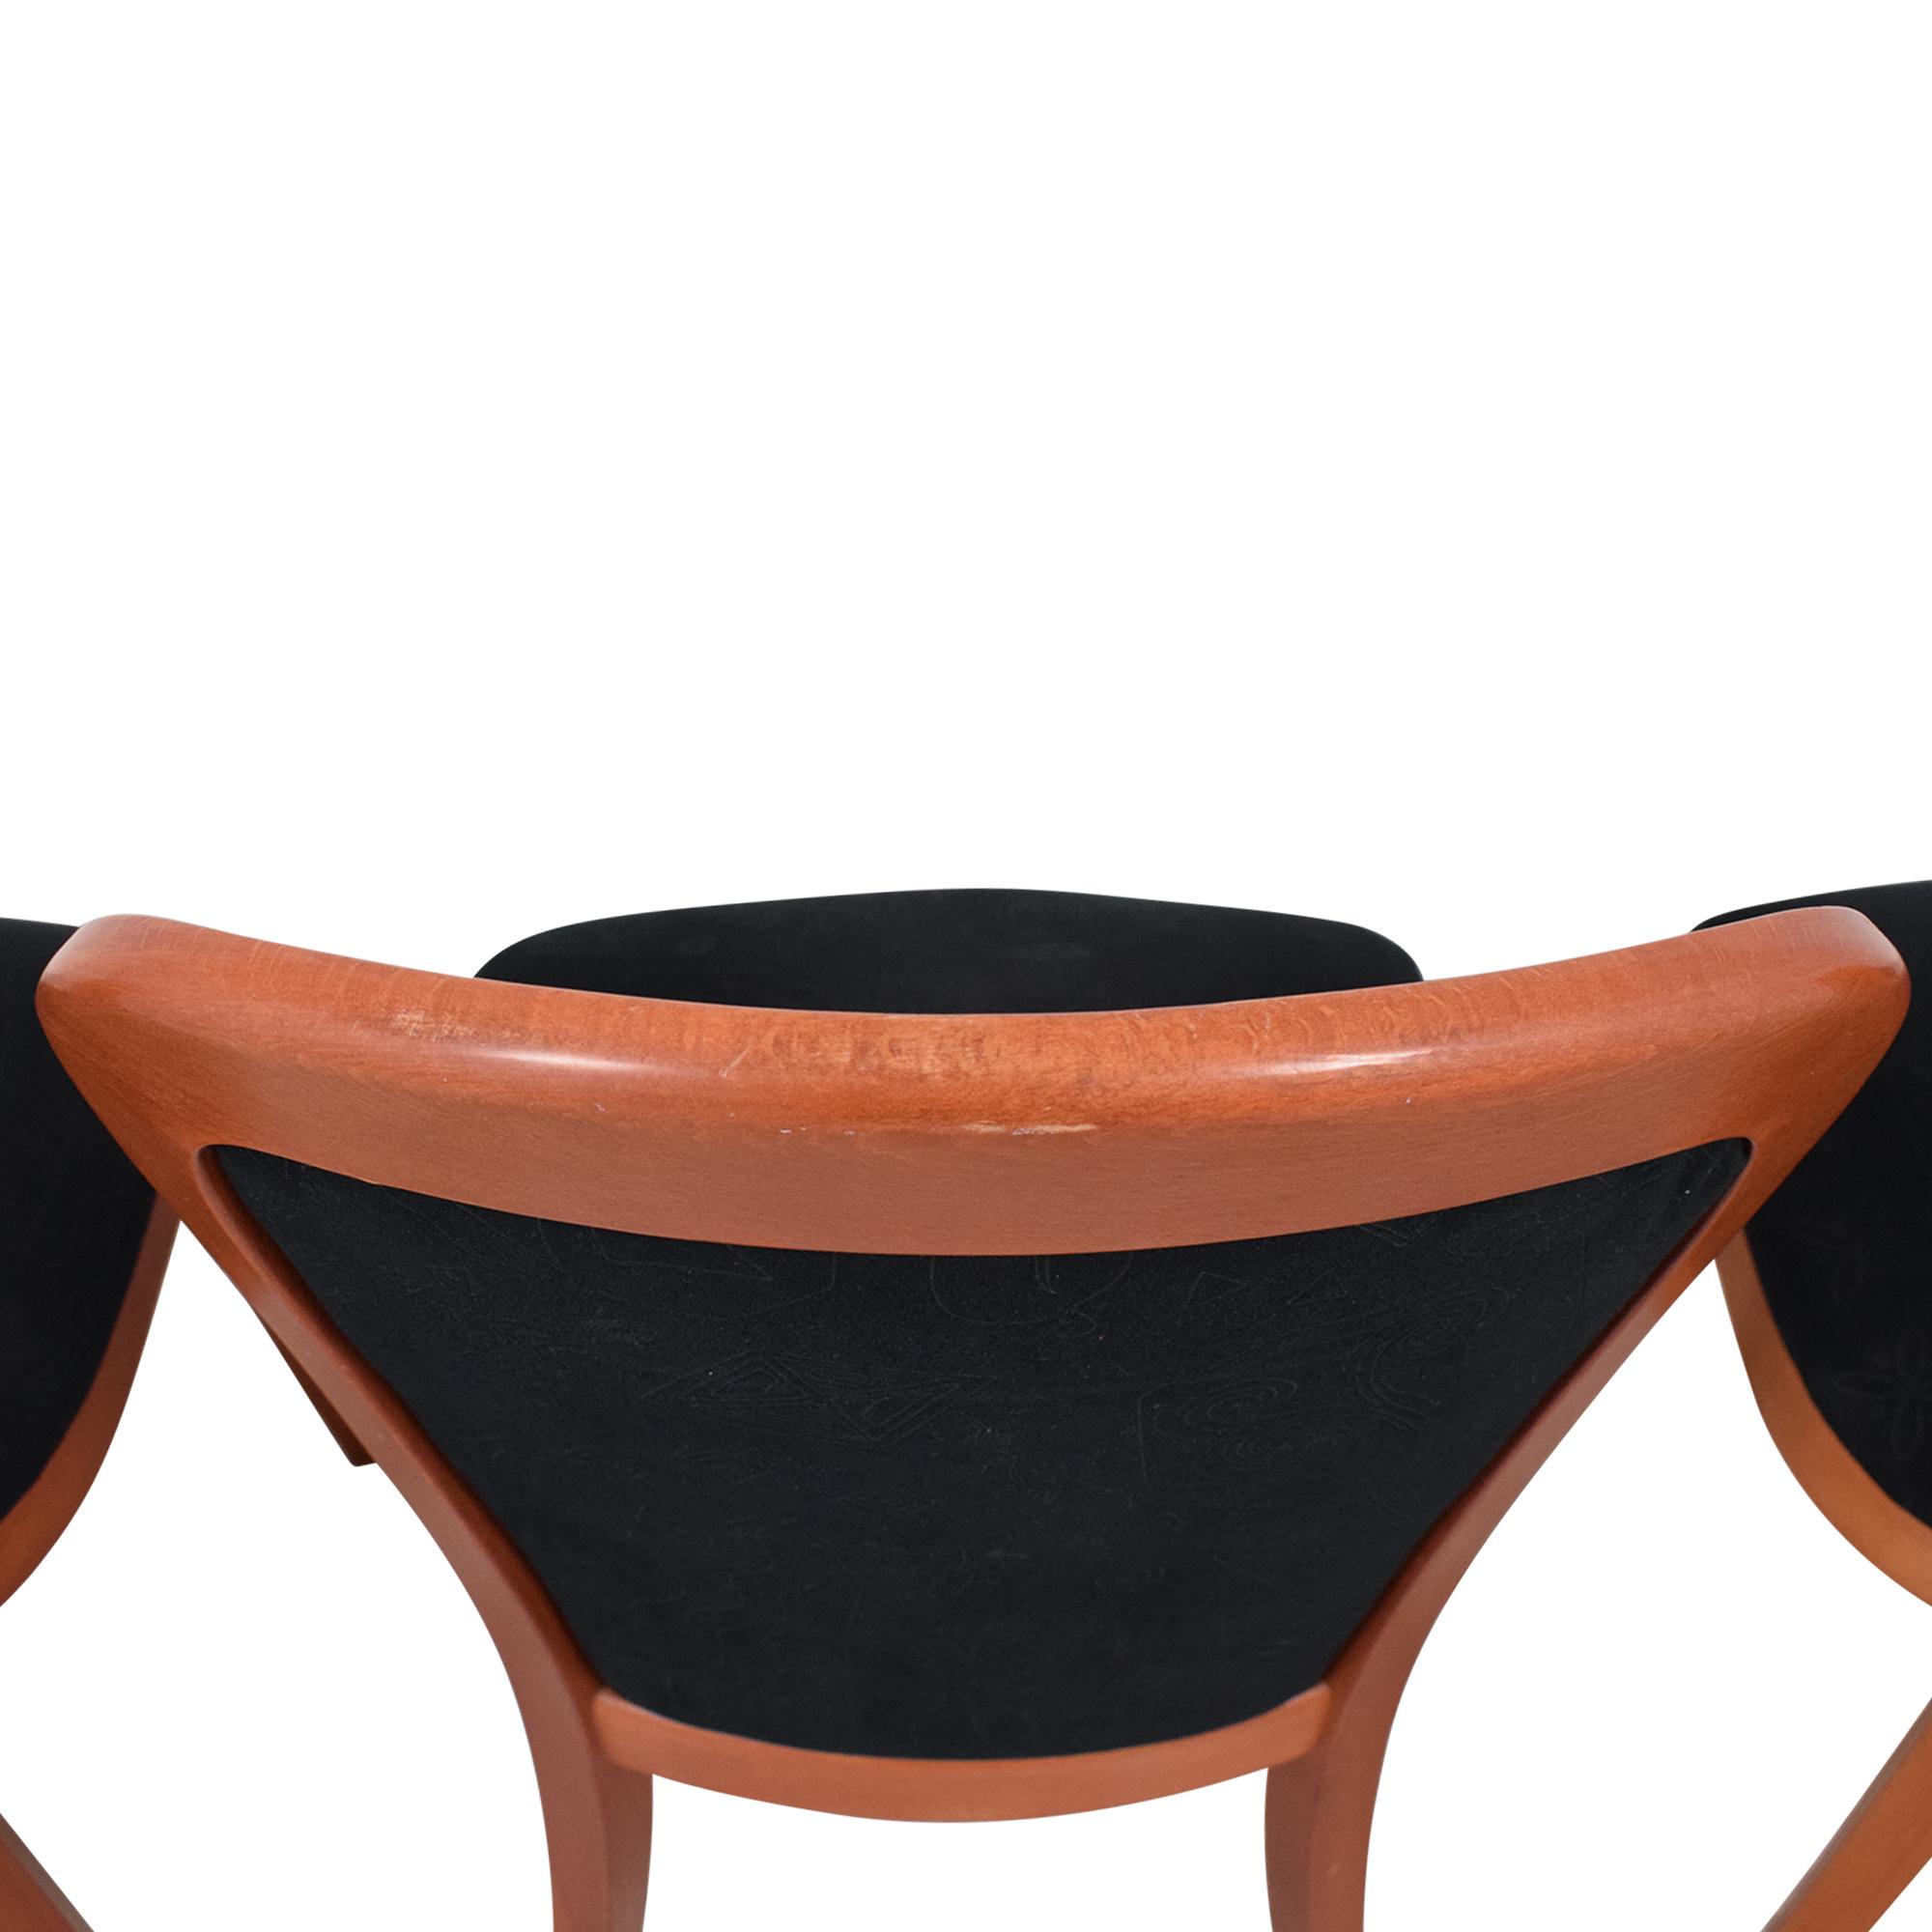 shop SA A. Sibau SA A. Sibau Dining Chairs online